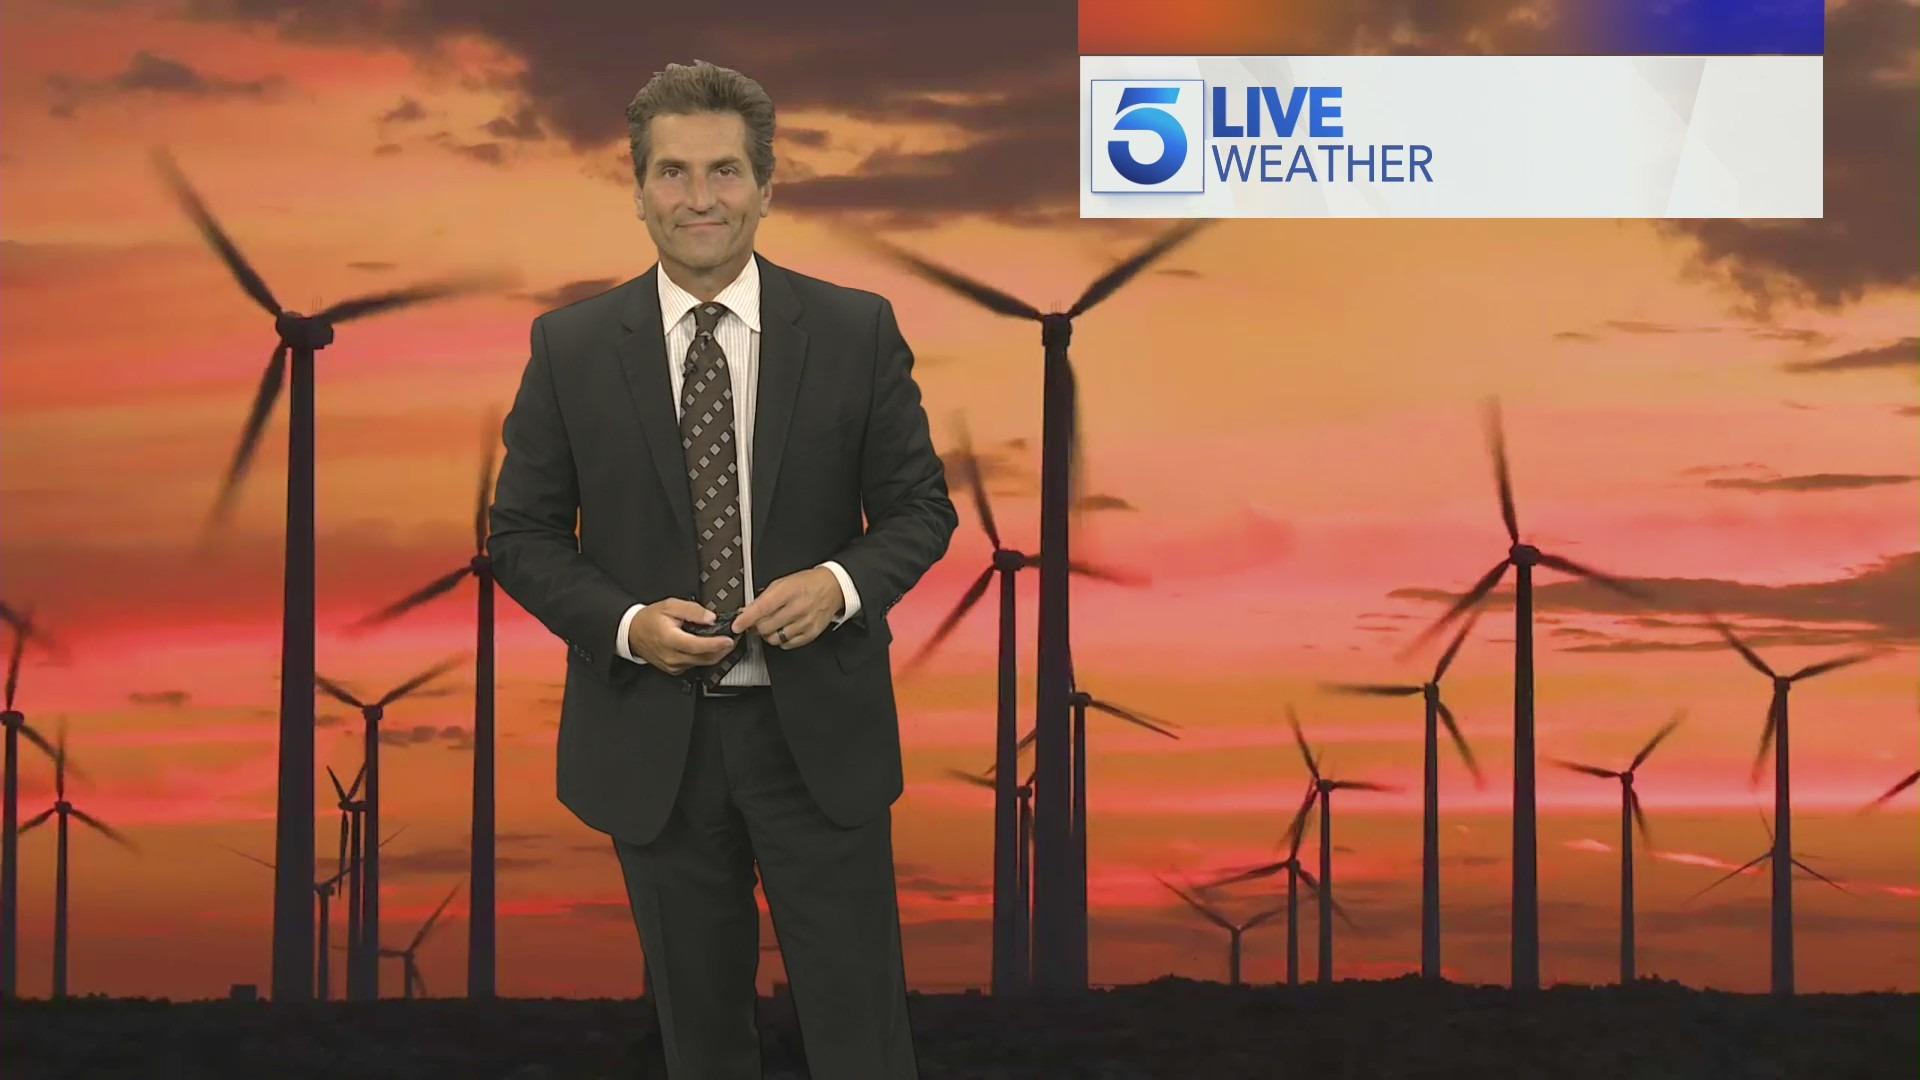 Henry Dicarlo on the KTLA 5 Morning News on May 6, 2021. (KTLA)